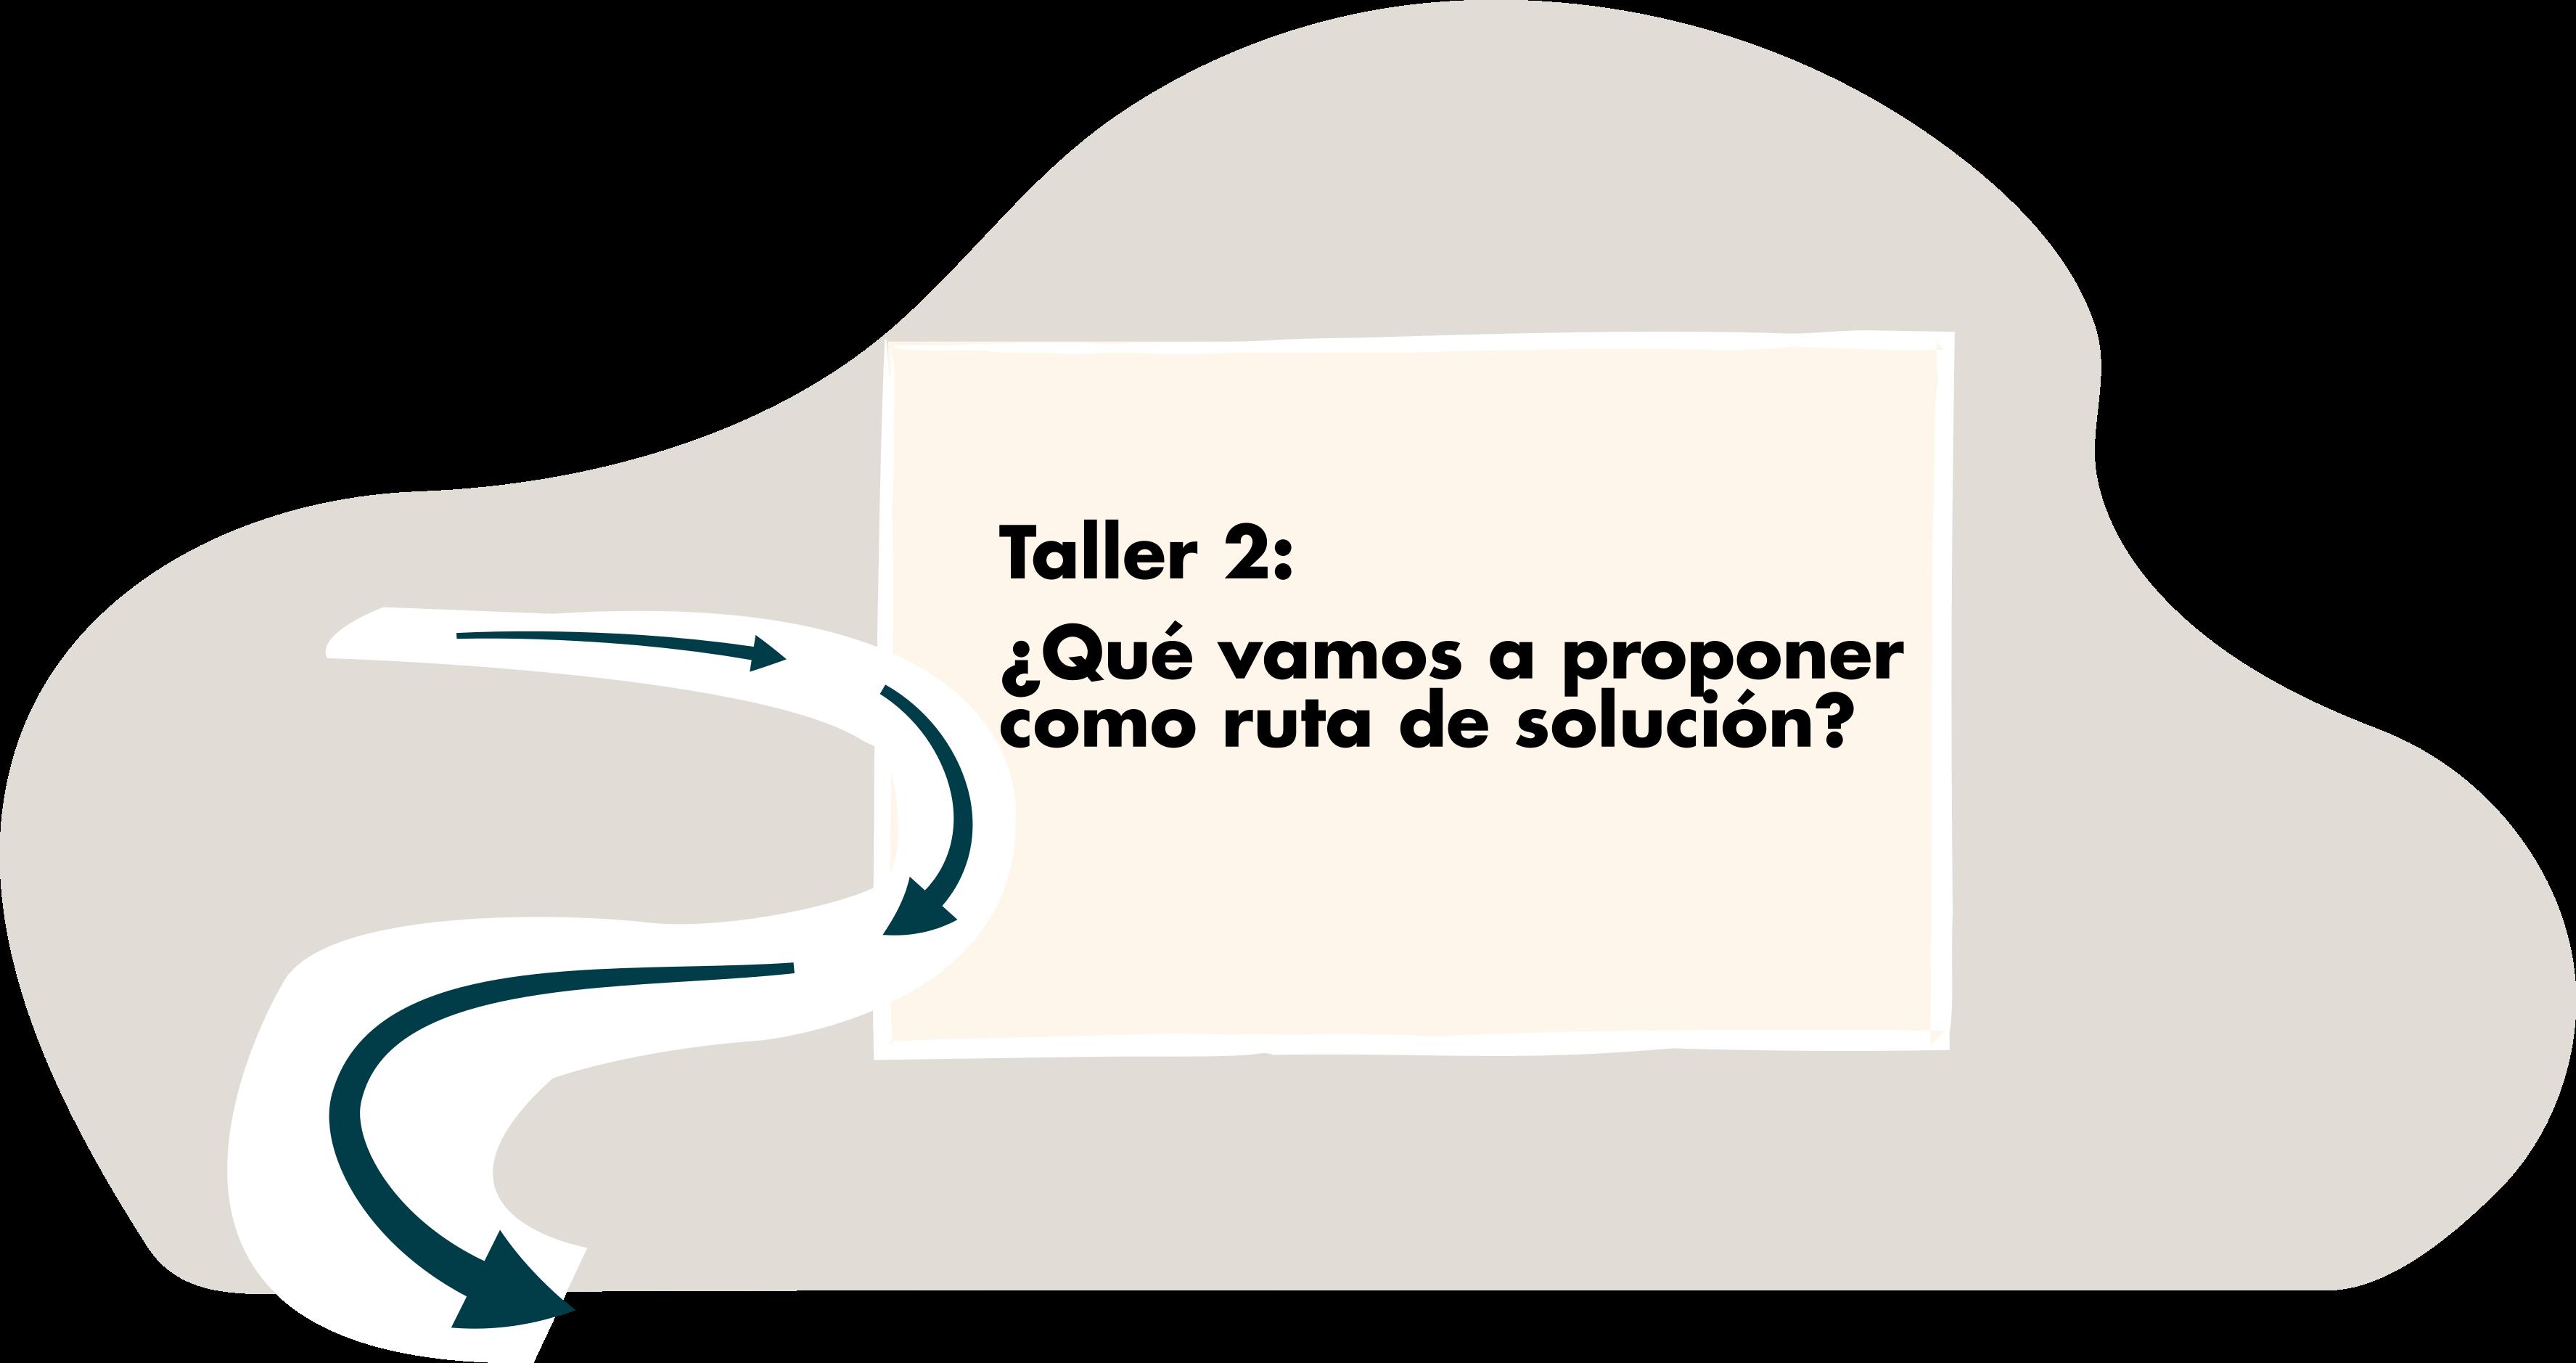 Taller 2: ¿Qué vamos a proponer como ruta de solución?